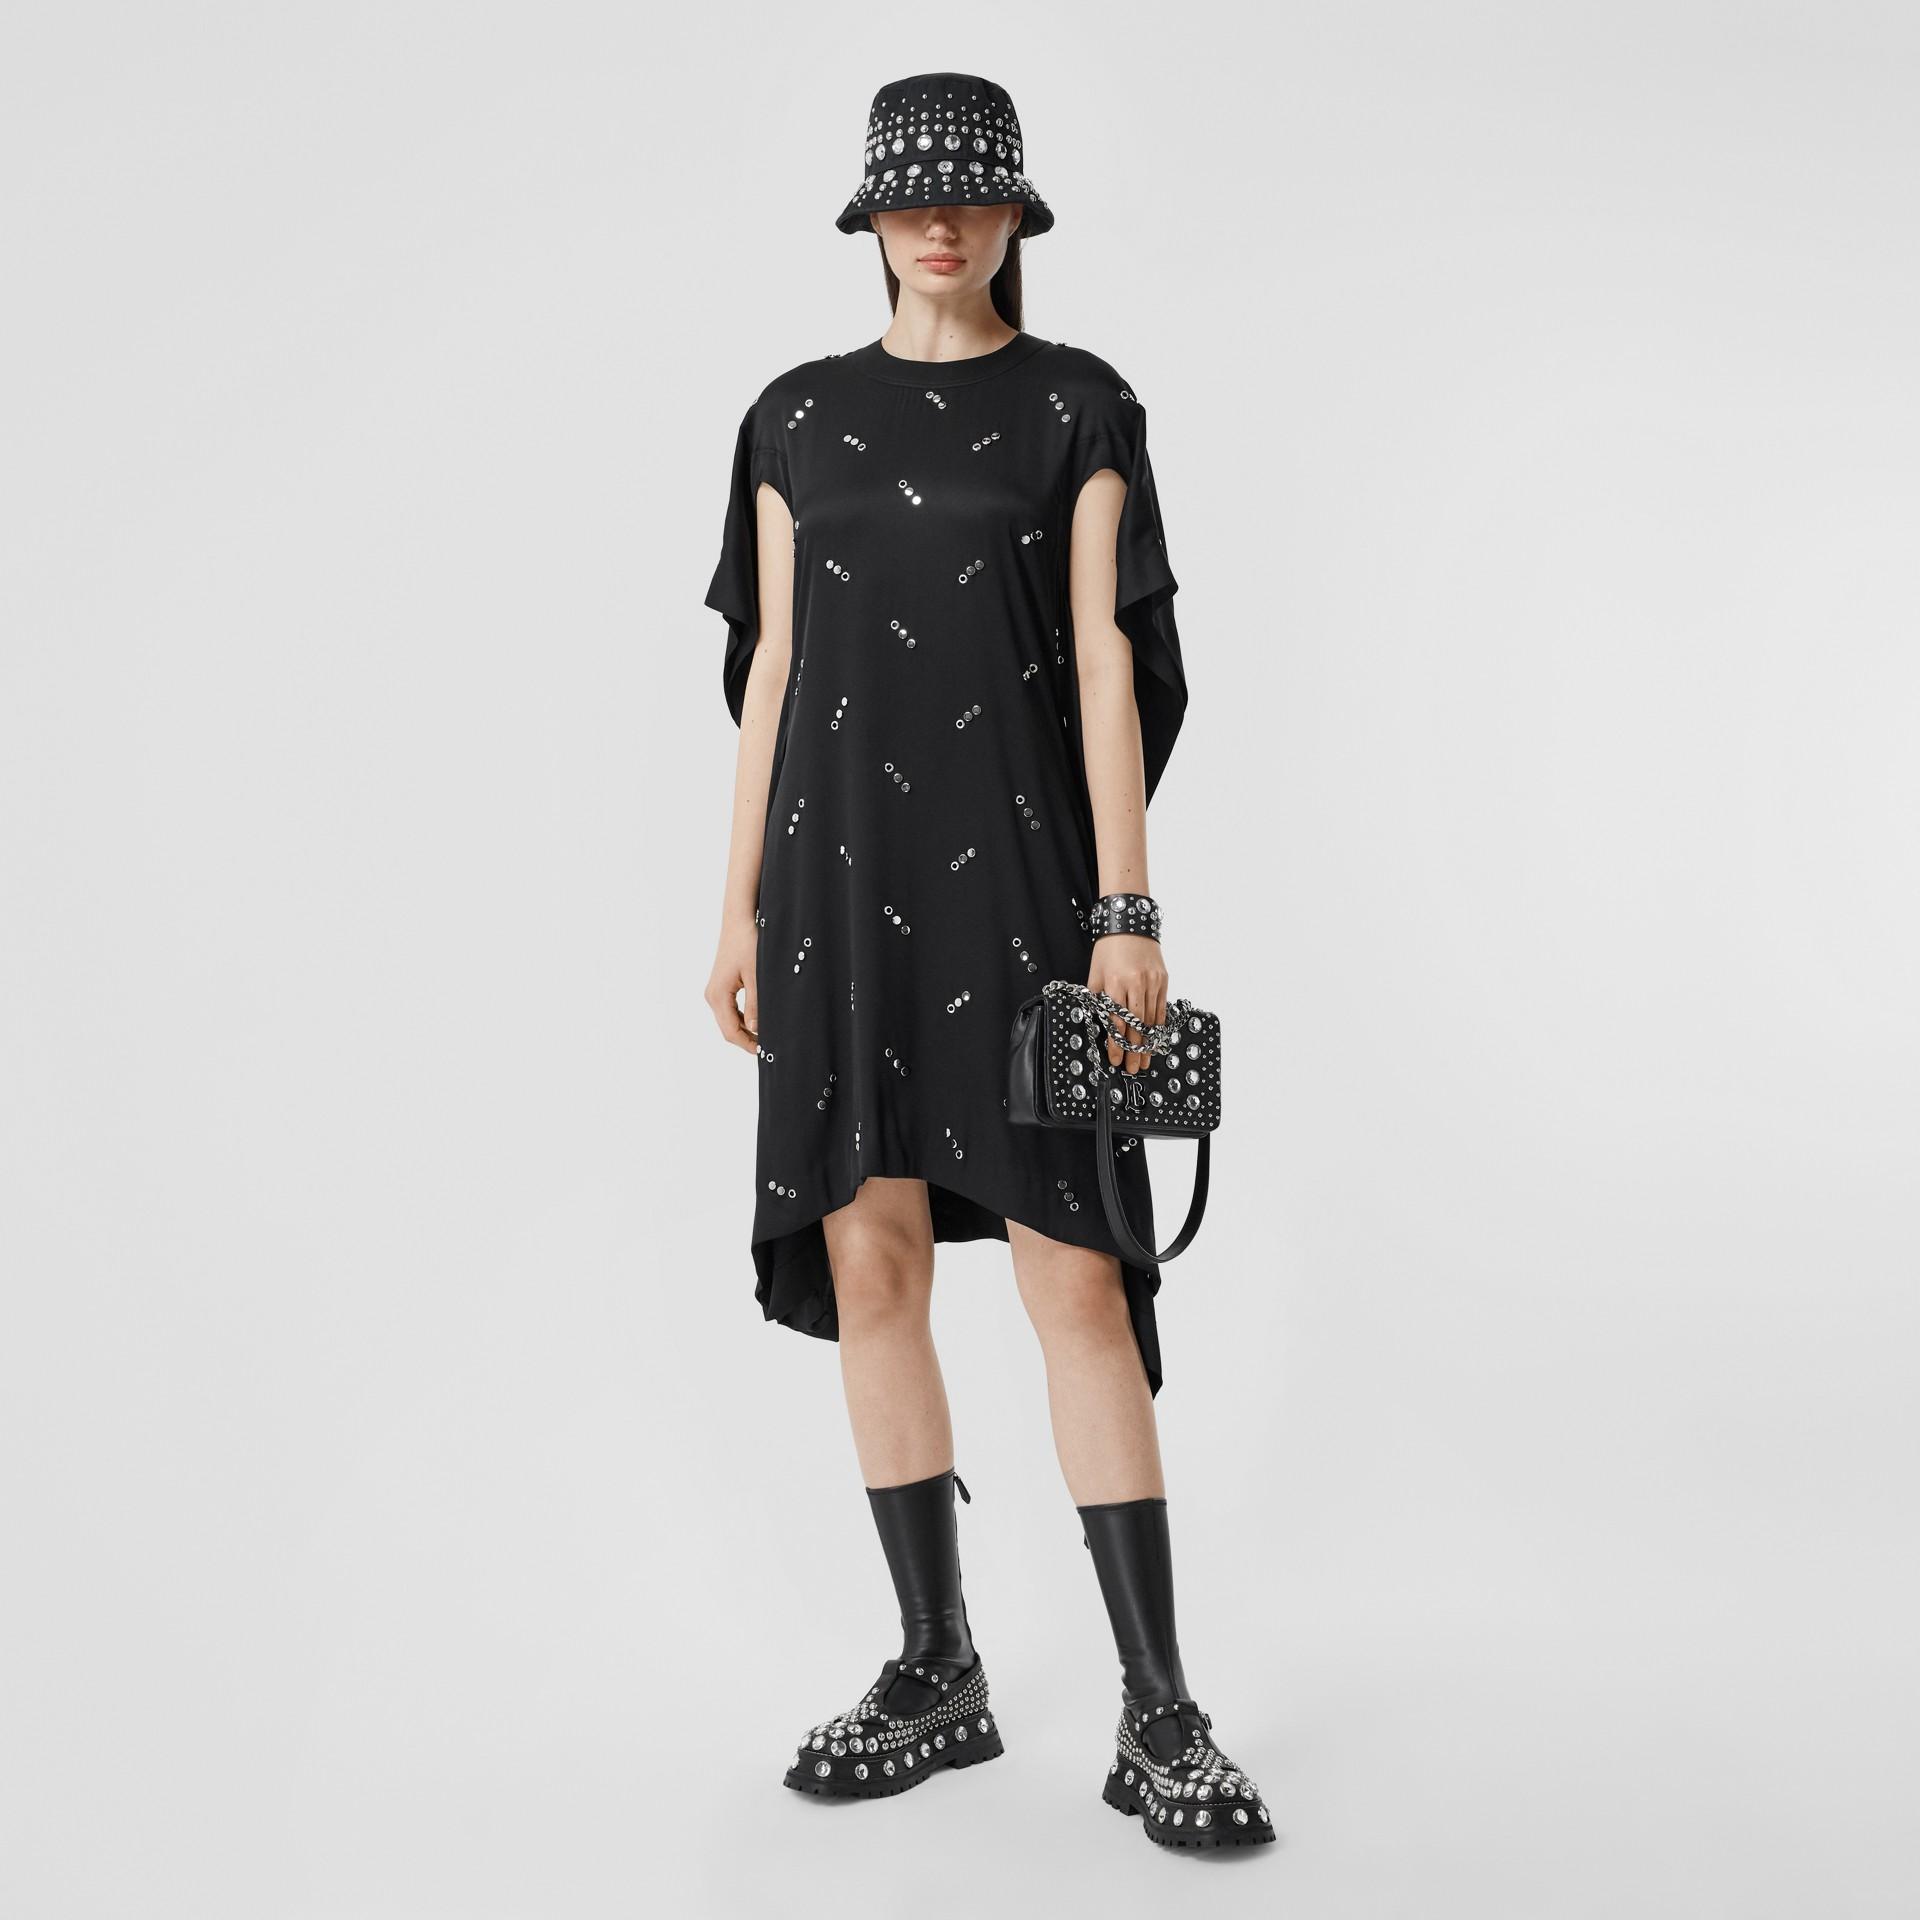 Small Embellished Lambskin Lola Bag in Black - Women | Burberry - gallery image 5